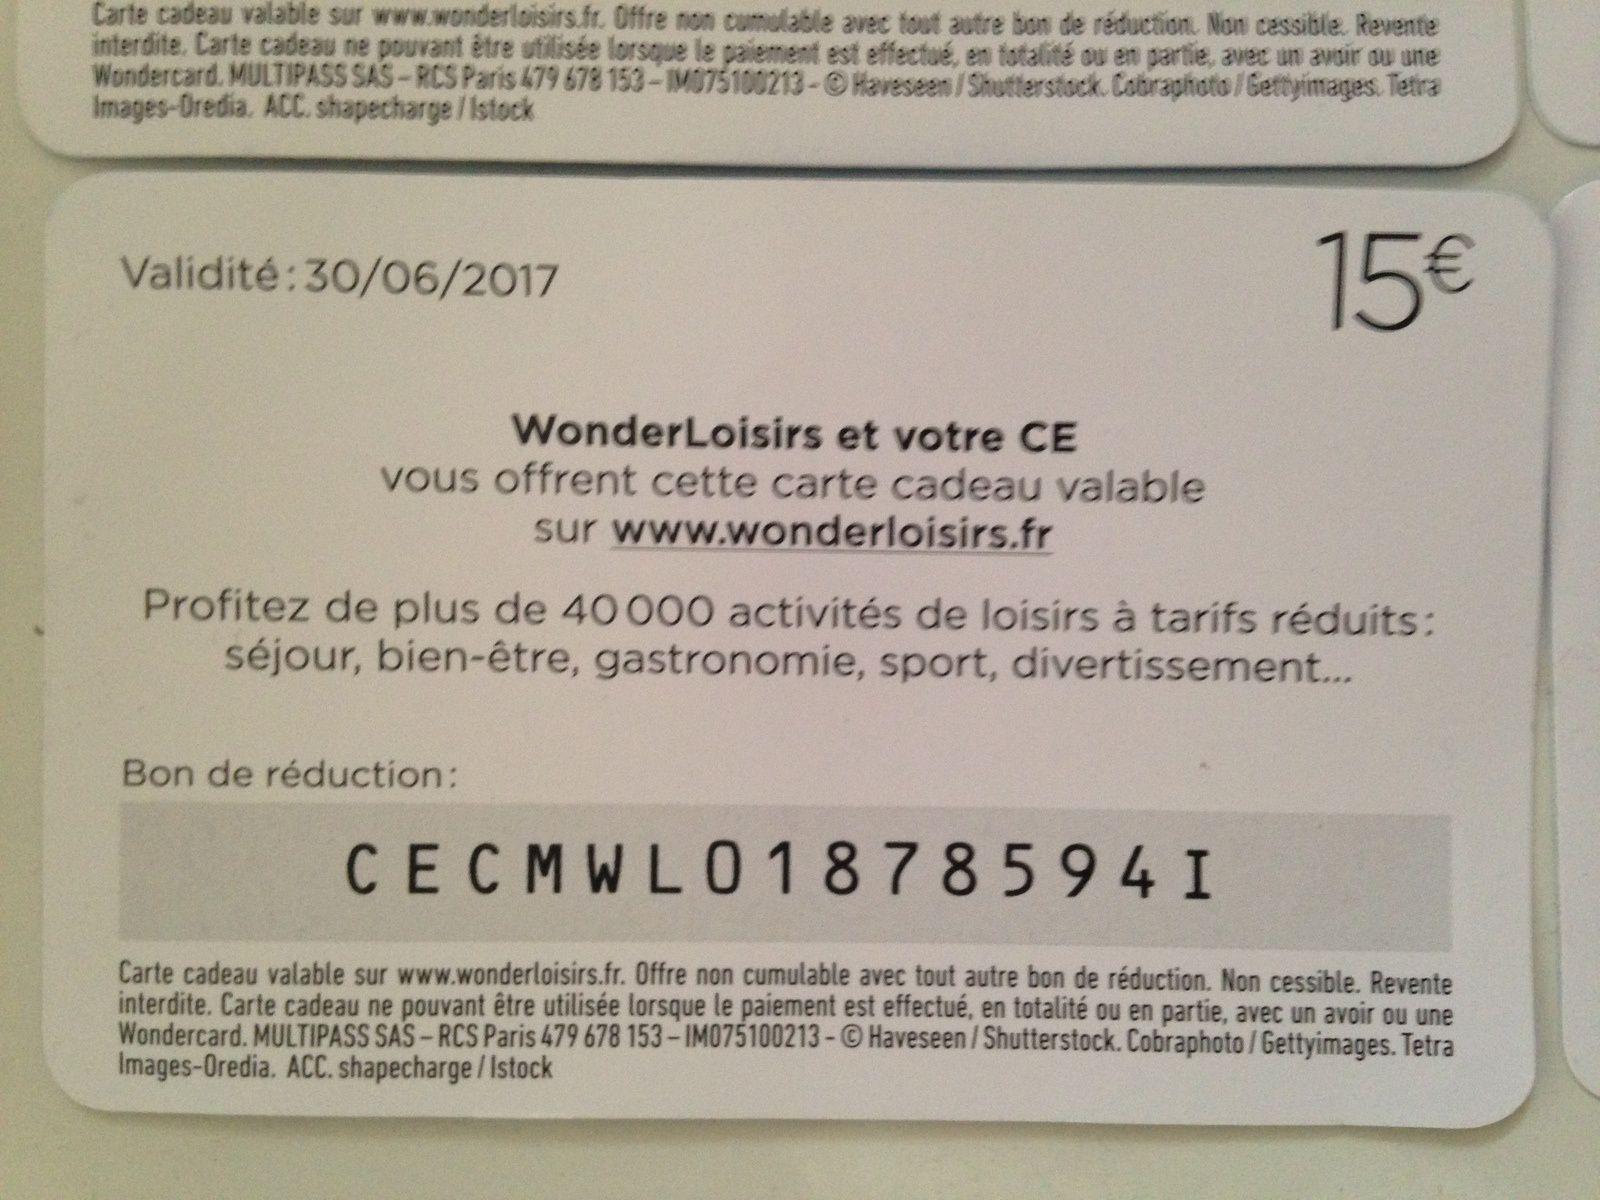 #15Eurosreduction #wonderbox